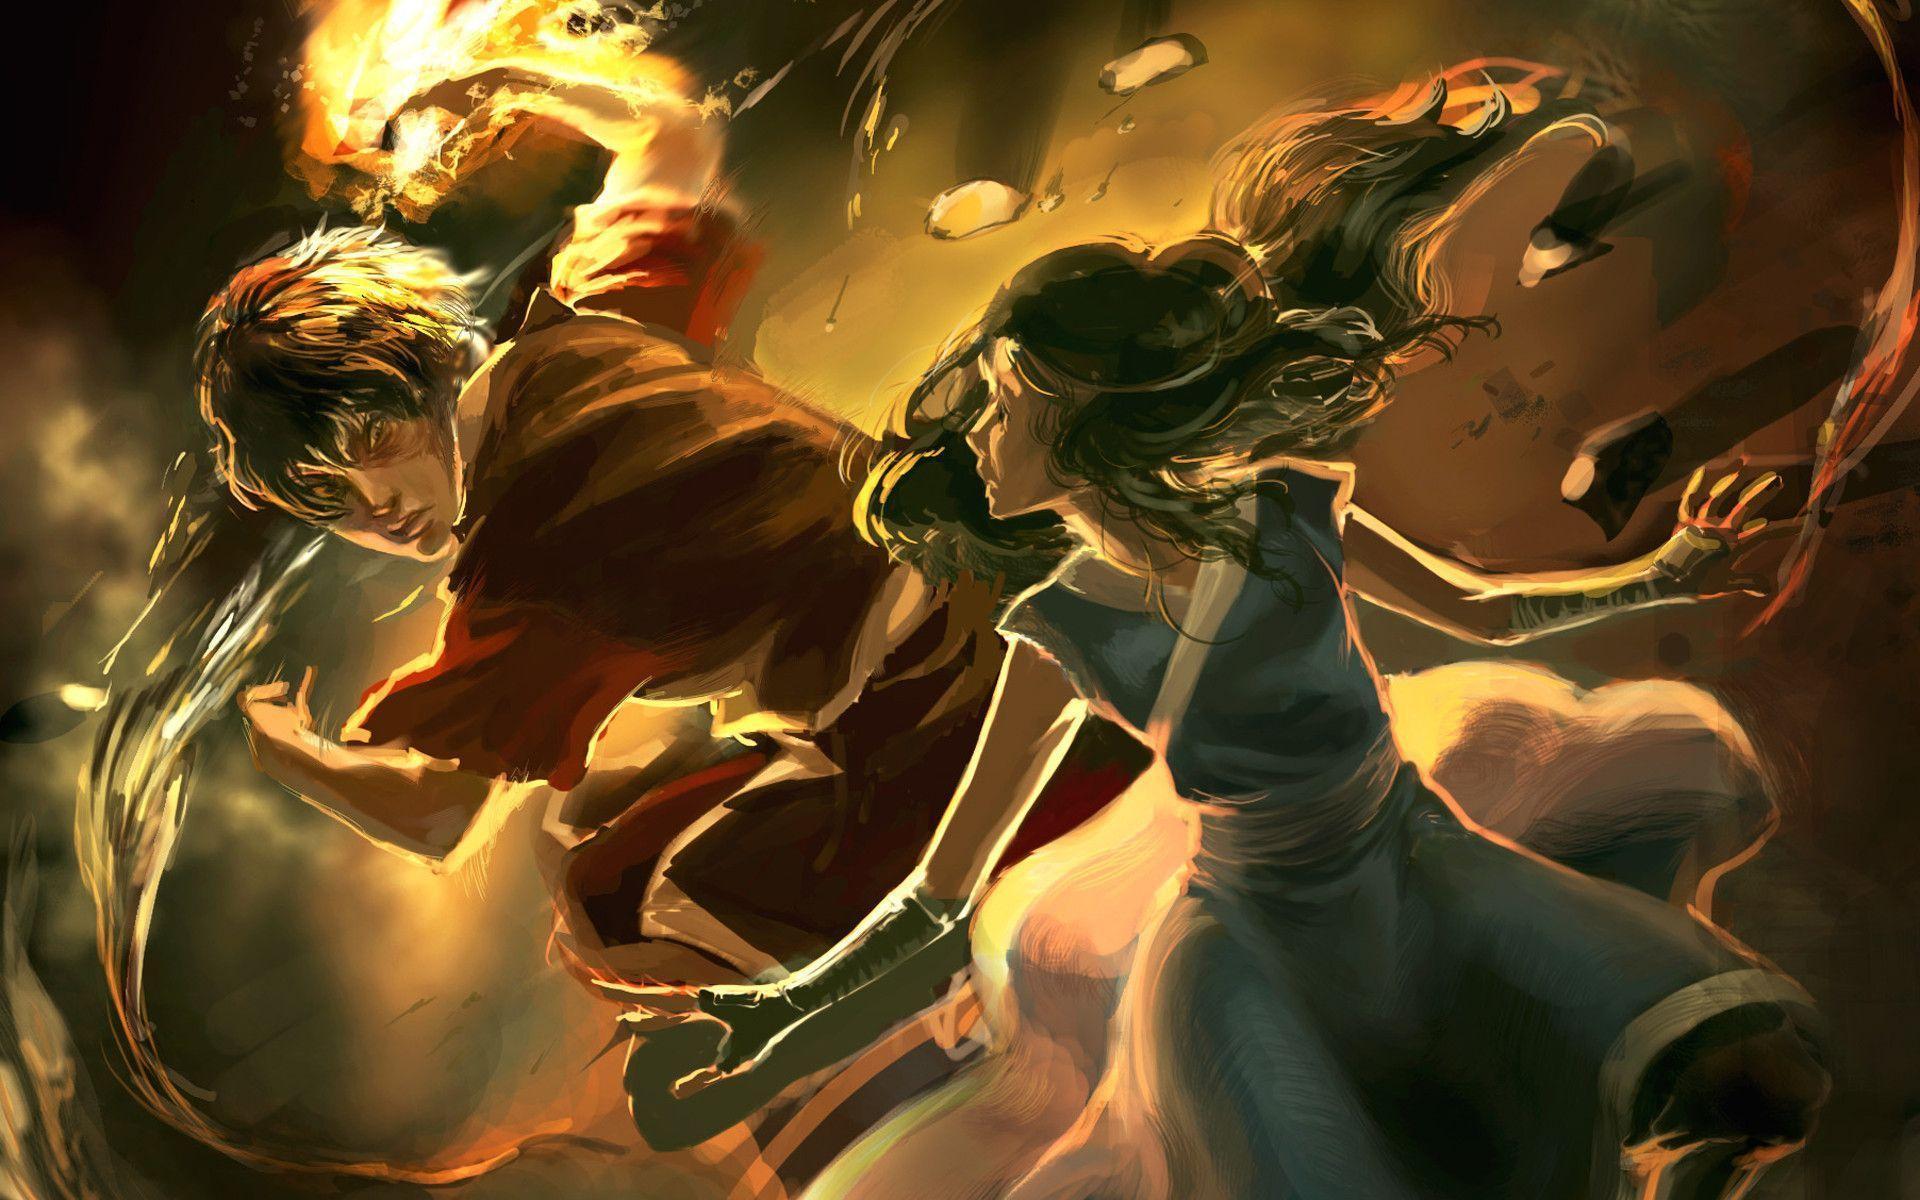 Anime Wallpaper Avatar The Last Airbender Aang